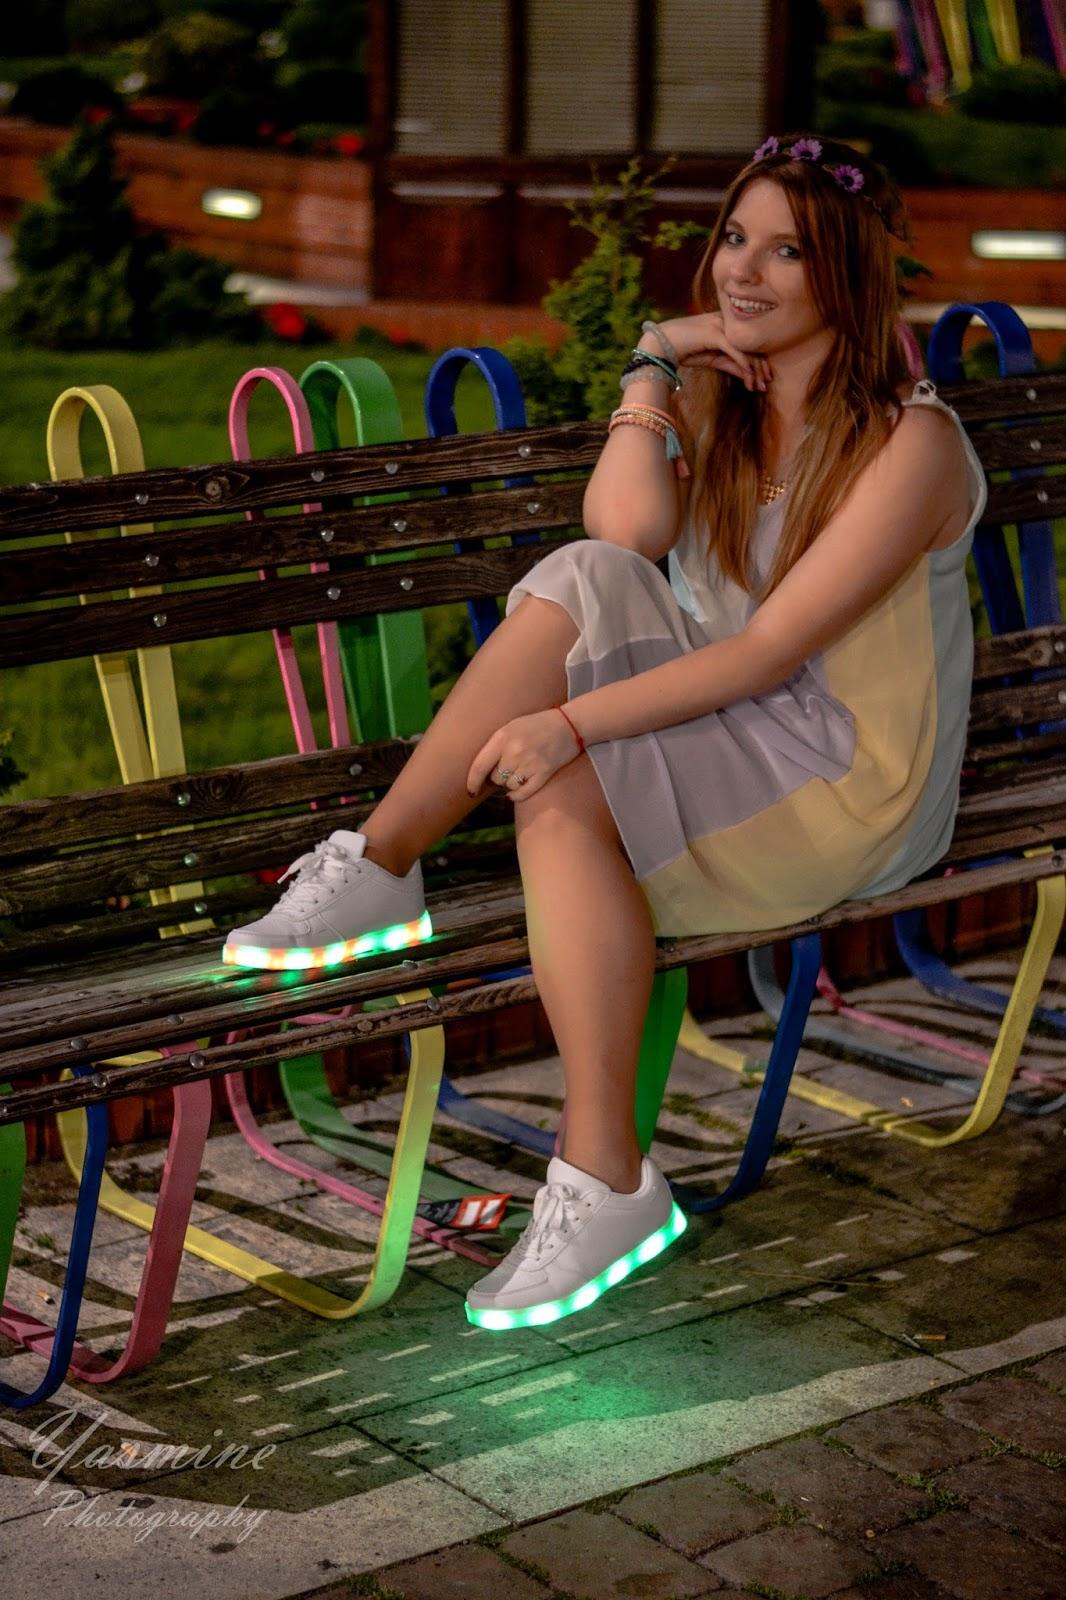 stylizacje festiwalowe ze smeakersami sneakersy disco light renee recenzja melodylaniella lookbook fashion look